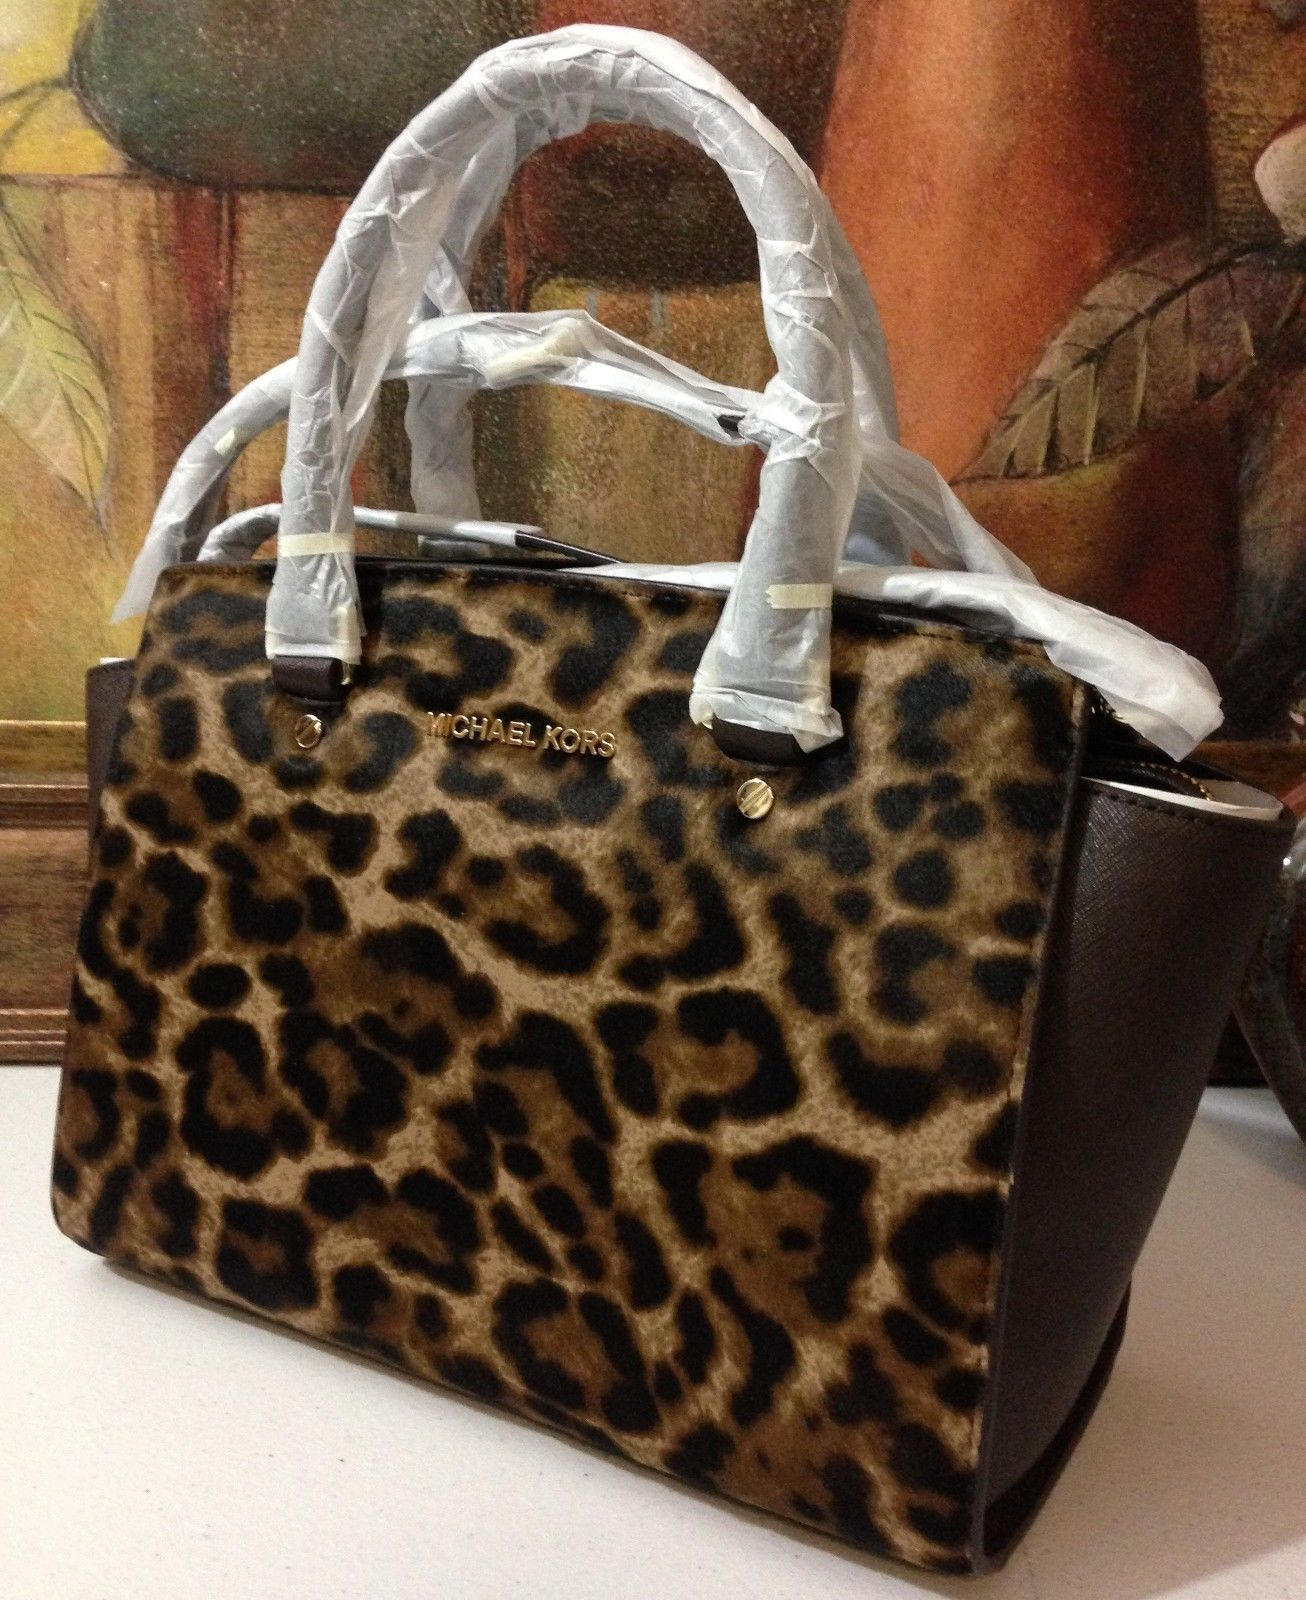 NWT Michael Kors Selma Medium Top Zip Satchel Haircalf Leopard MSRP $398